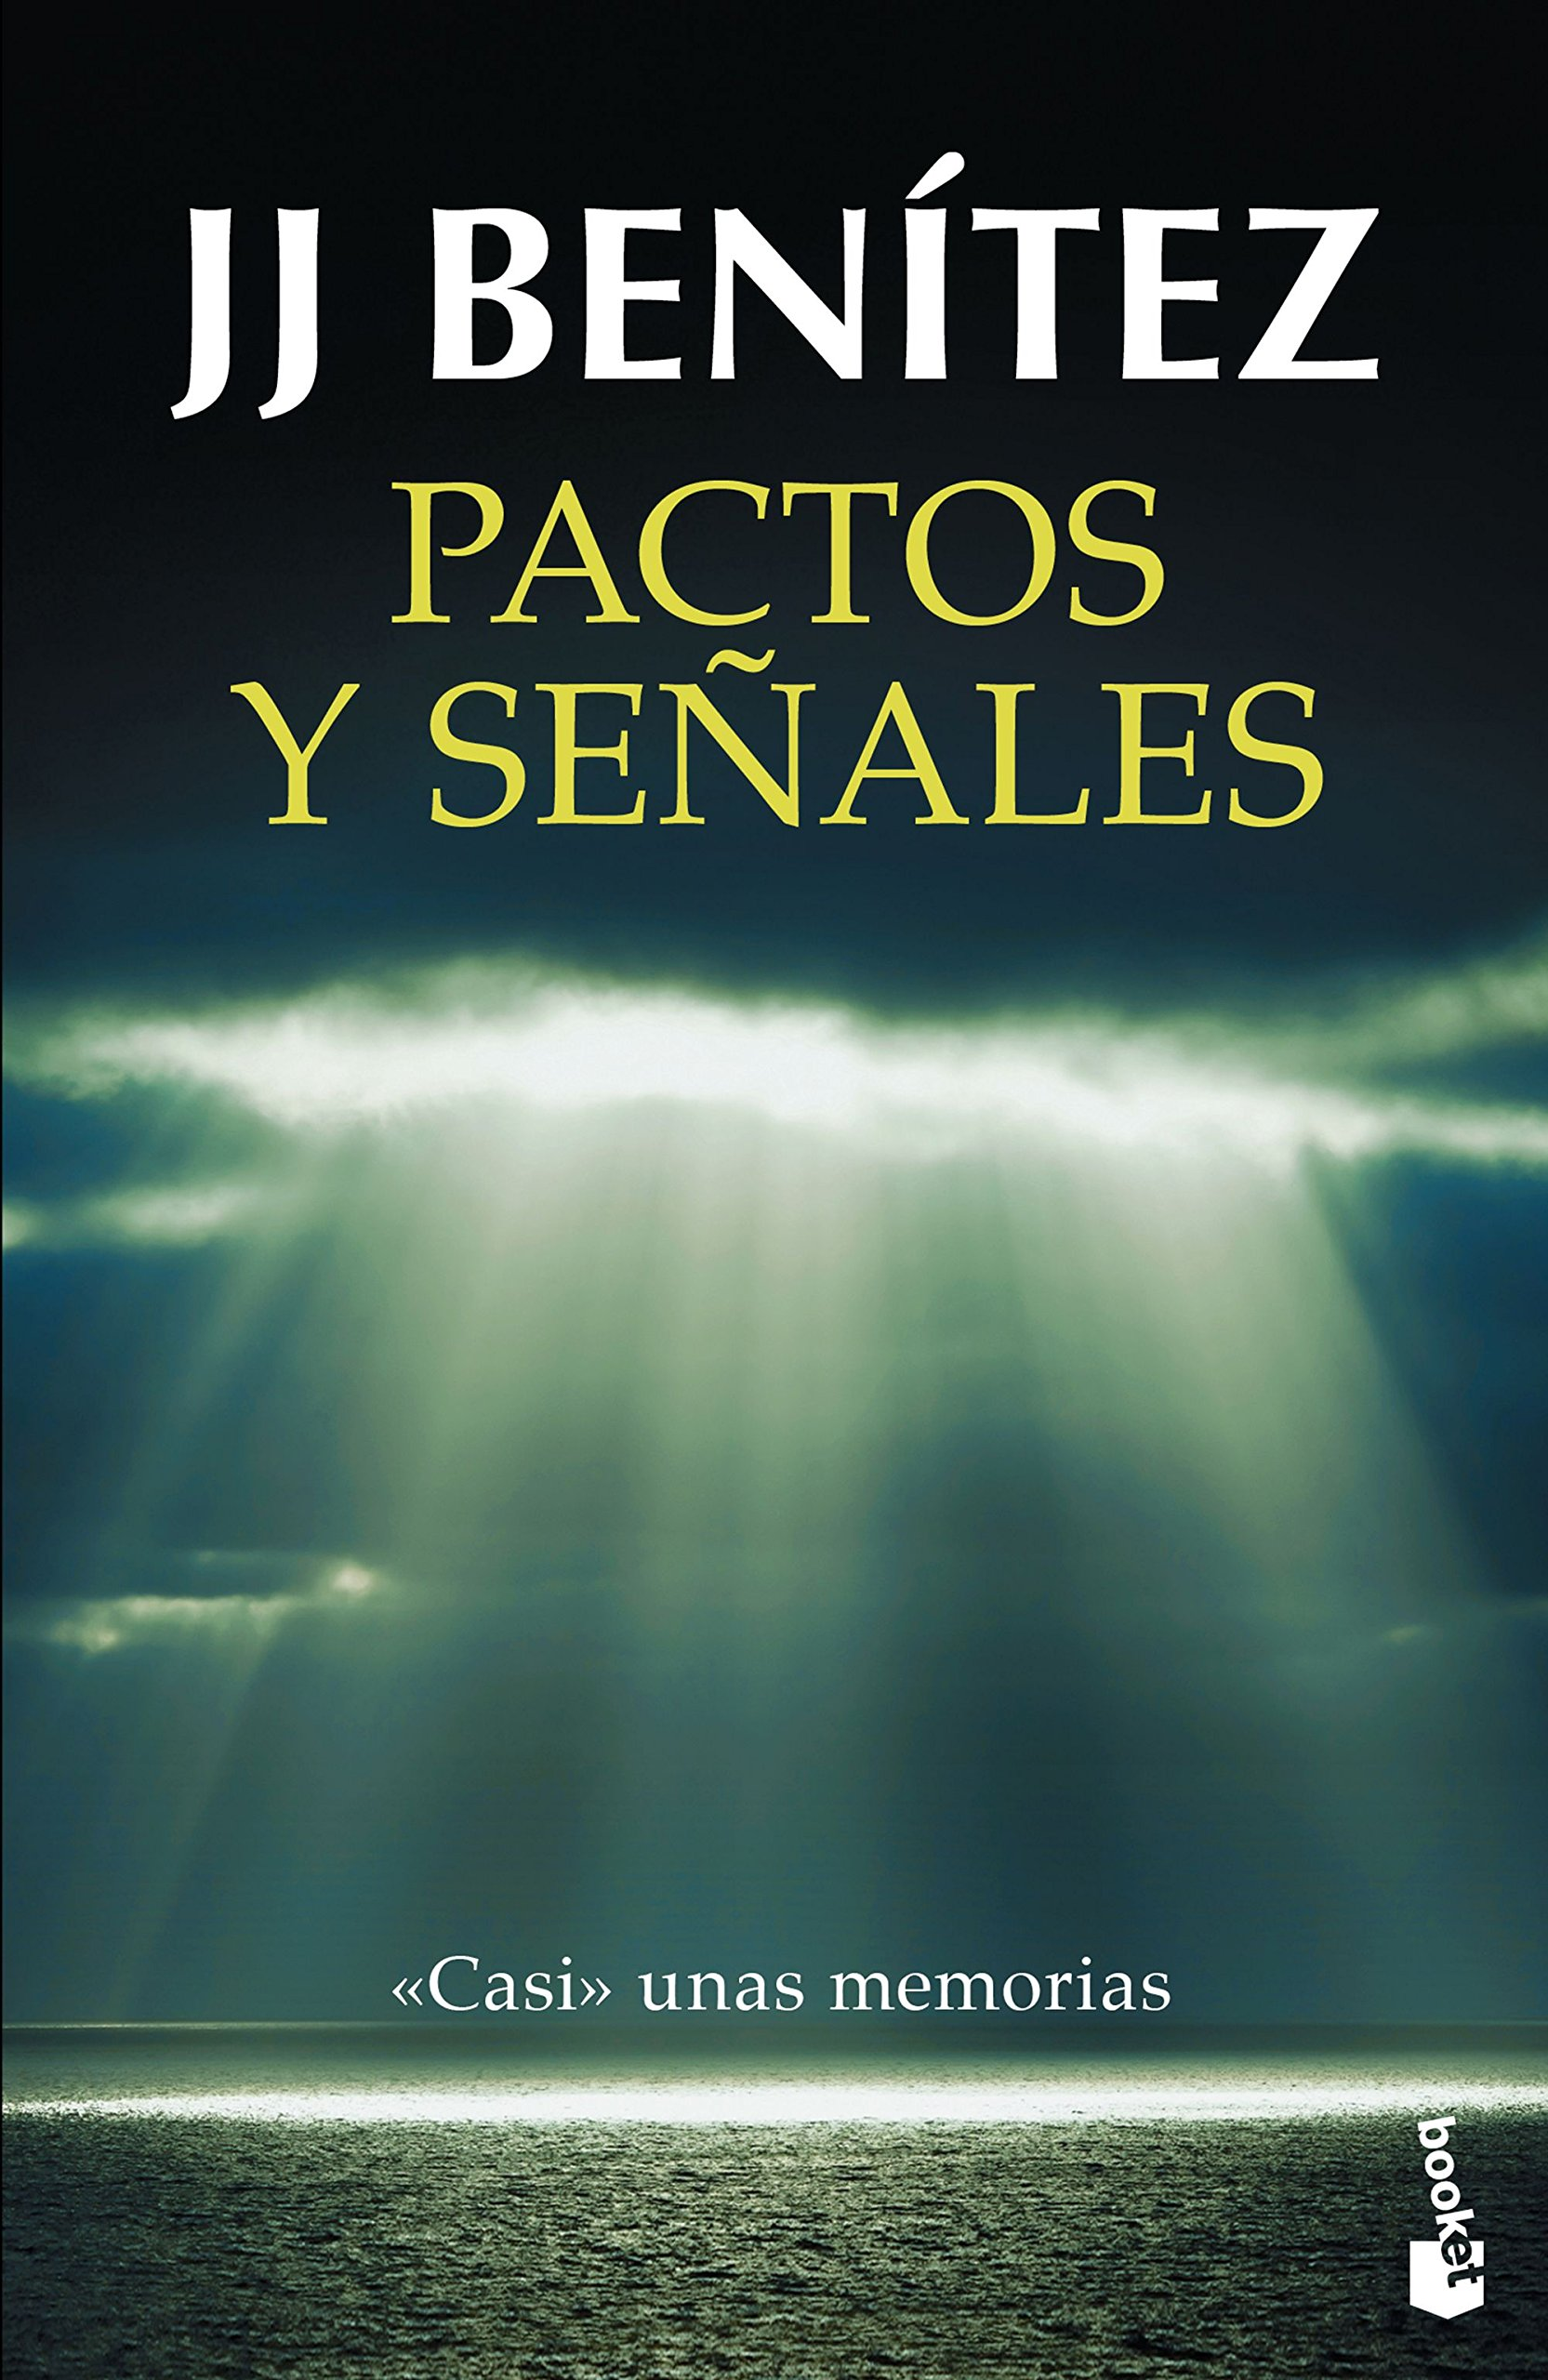 Pactos y señales: 2 (Biblioteca J. J. Benítez): Amazon.es: J. J. ...